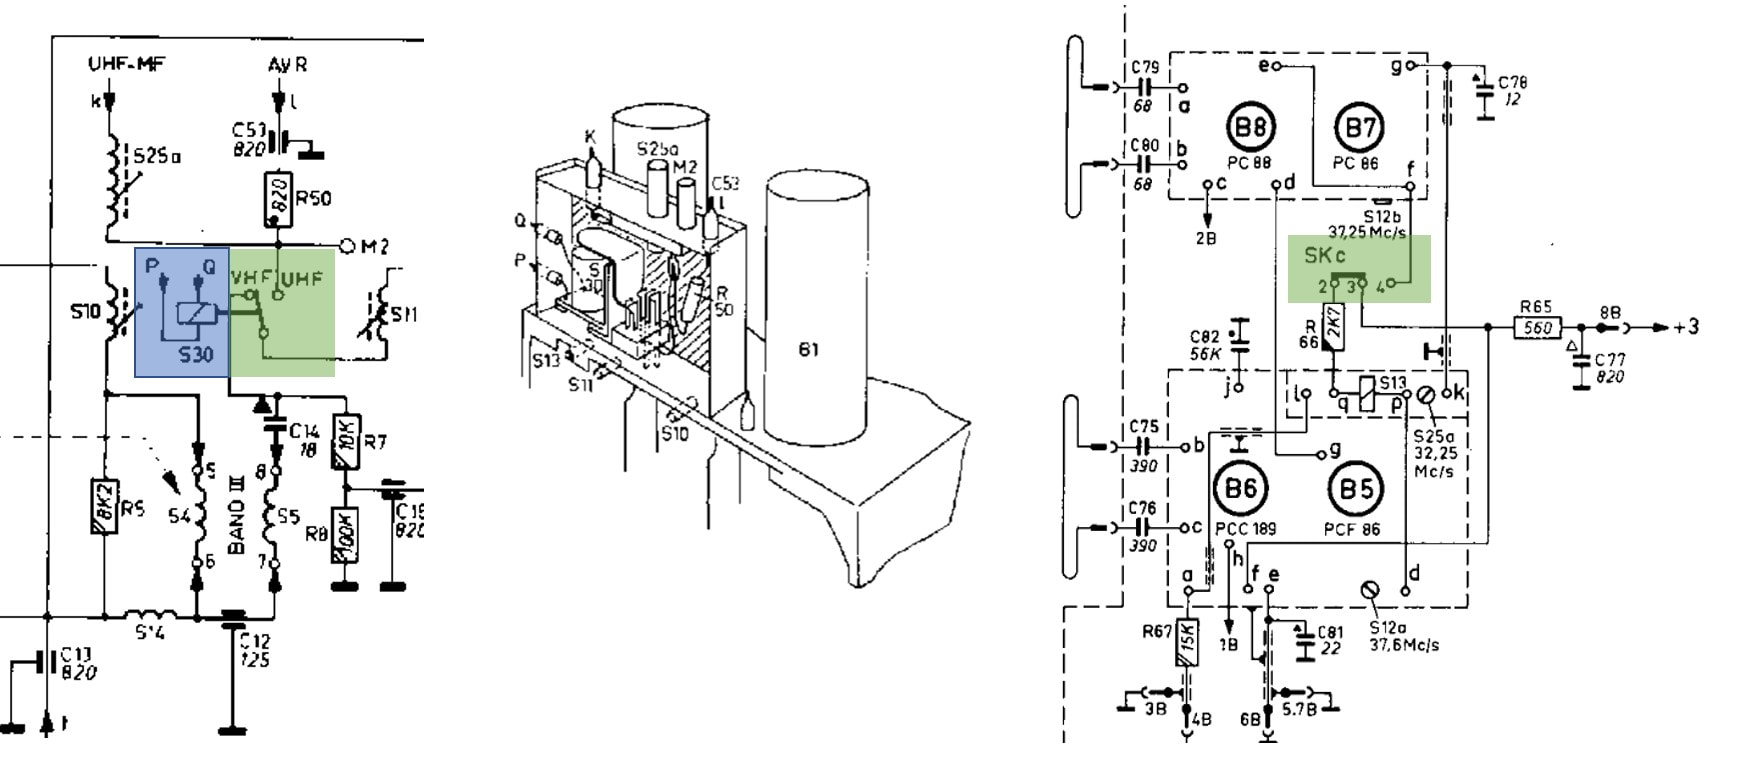 TV Tuner History pt2: UHF and transistors